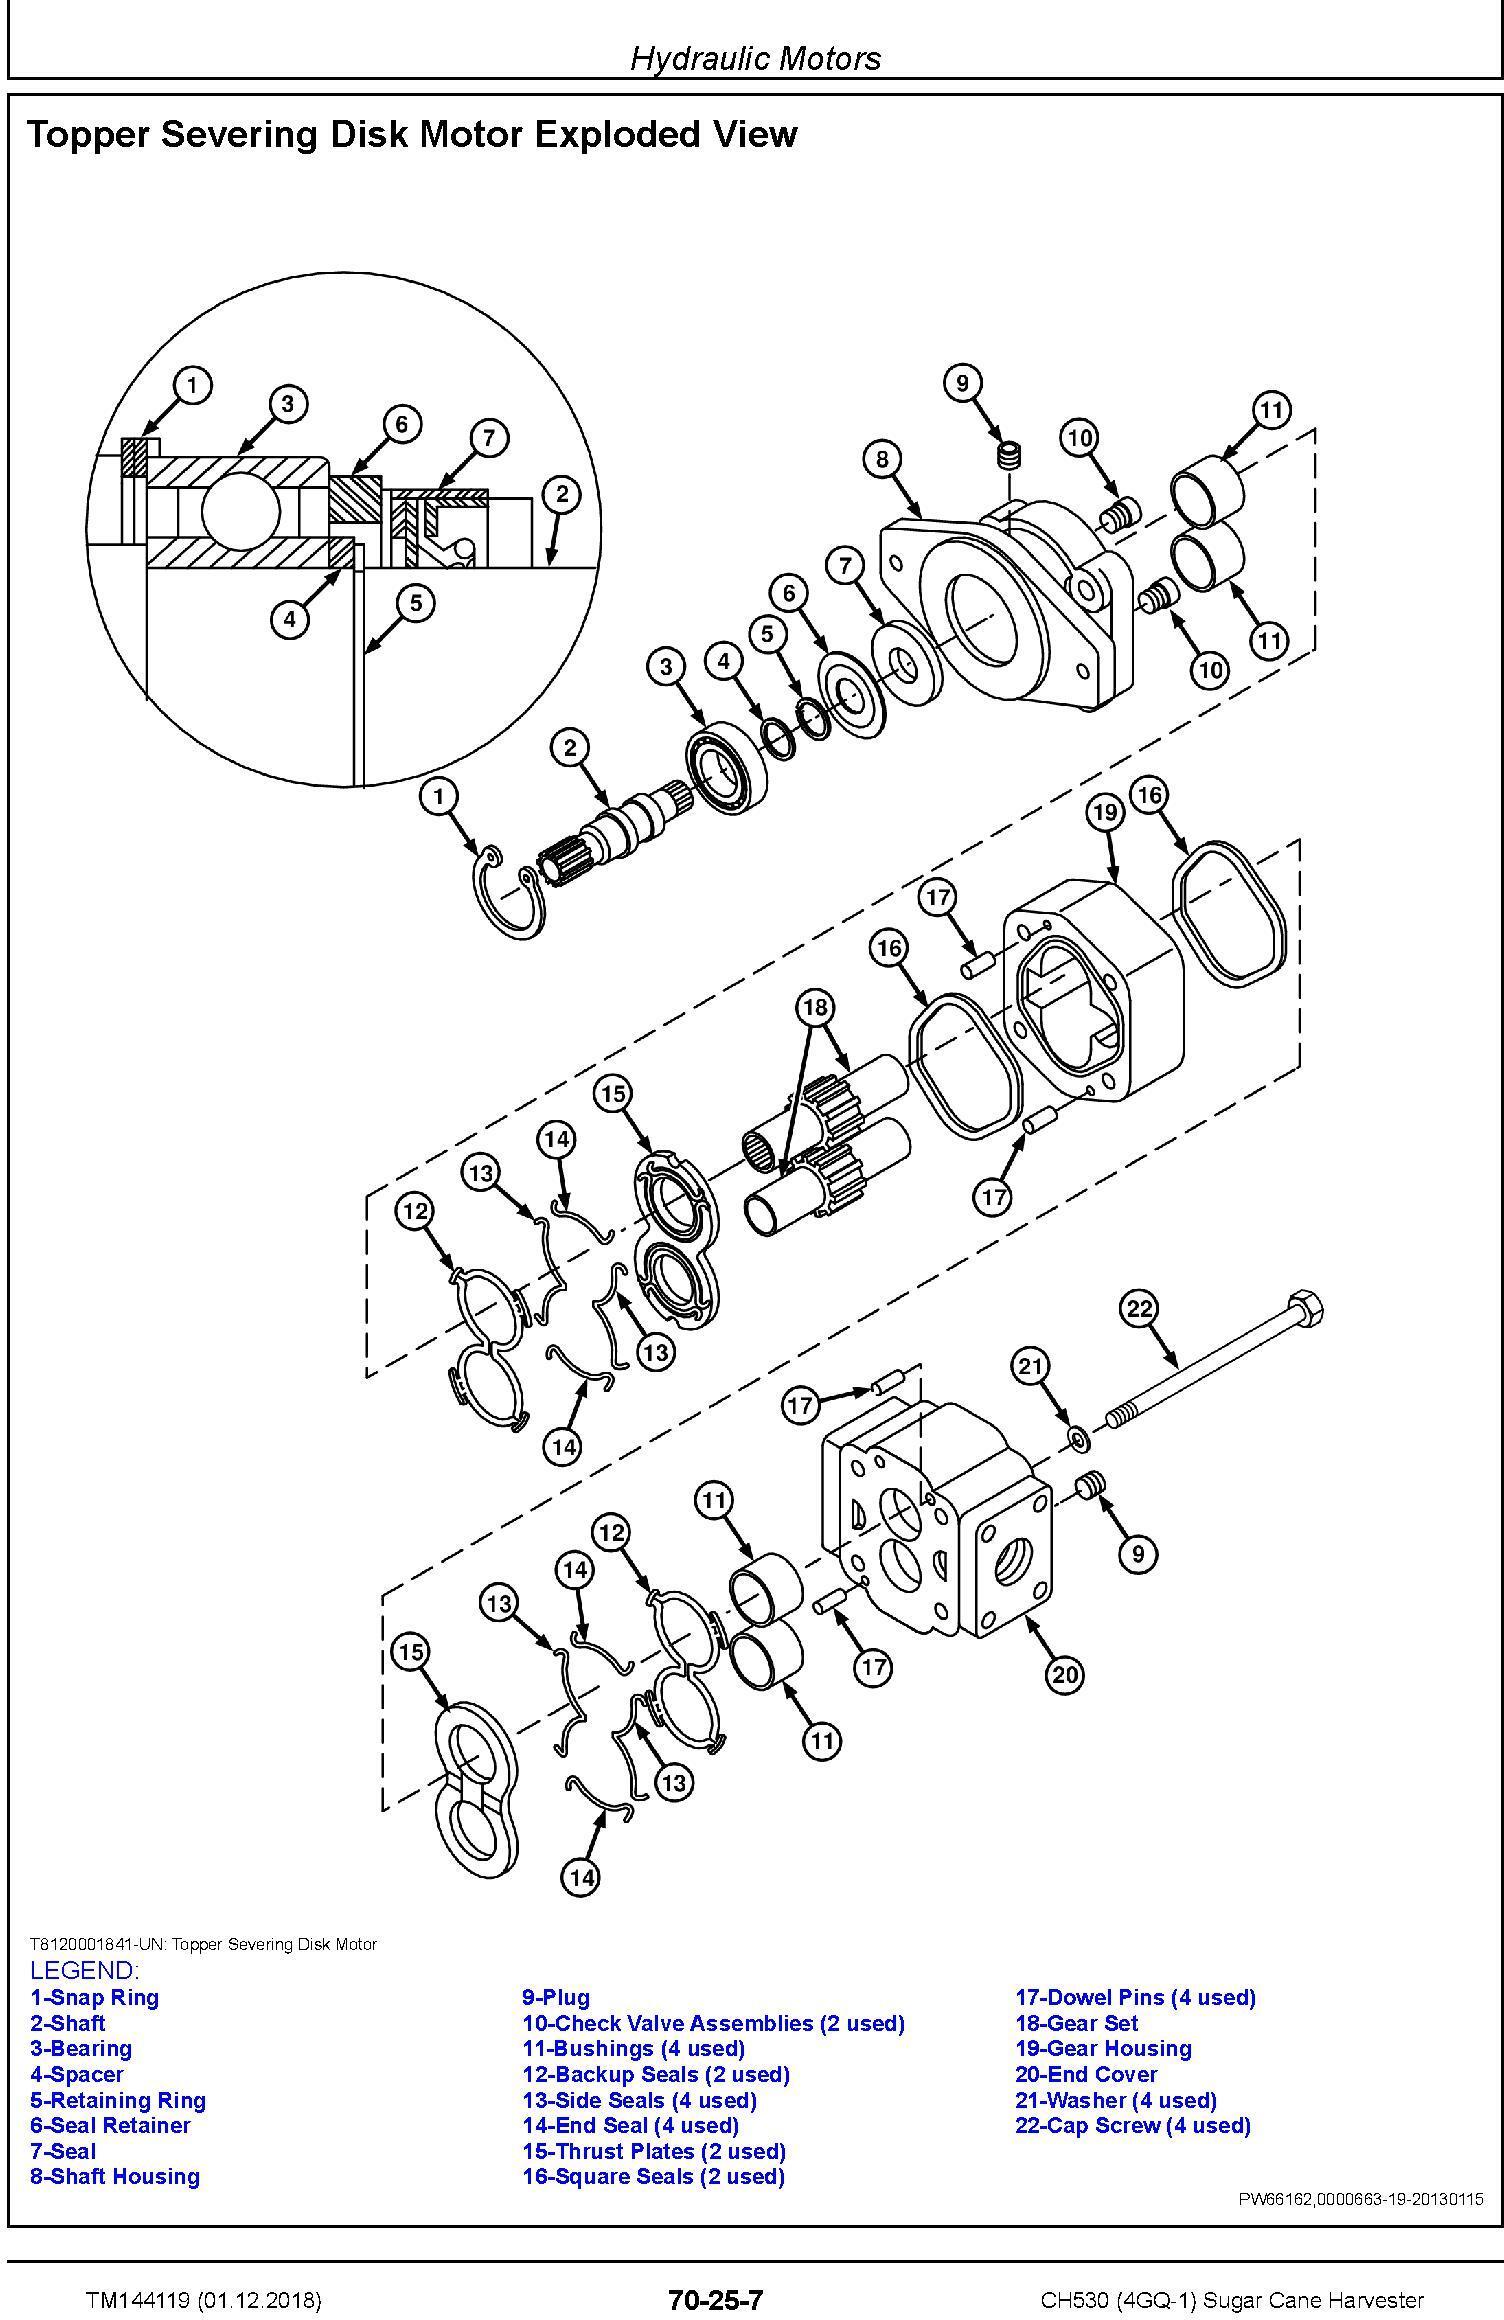 John Deere CH530 (4GQ-1) Sugar Cane Harvester Repair Service Technical Manual (TM144119) - 2